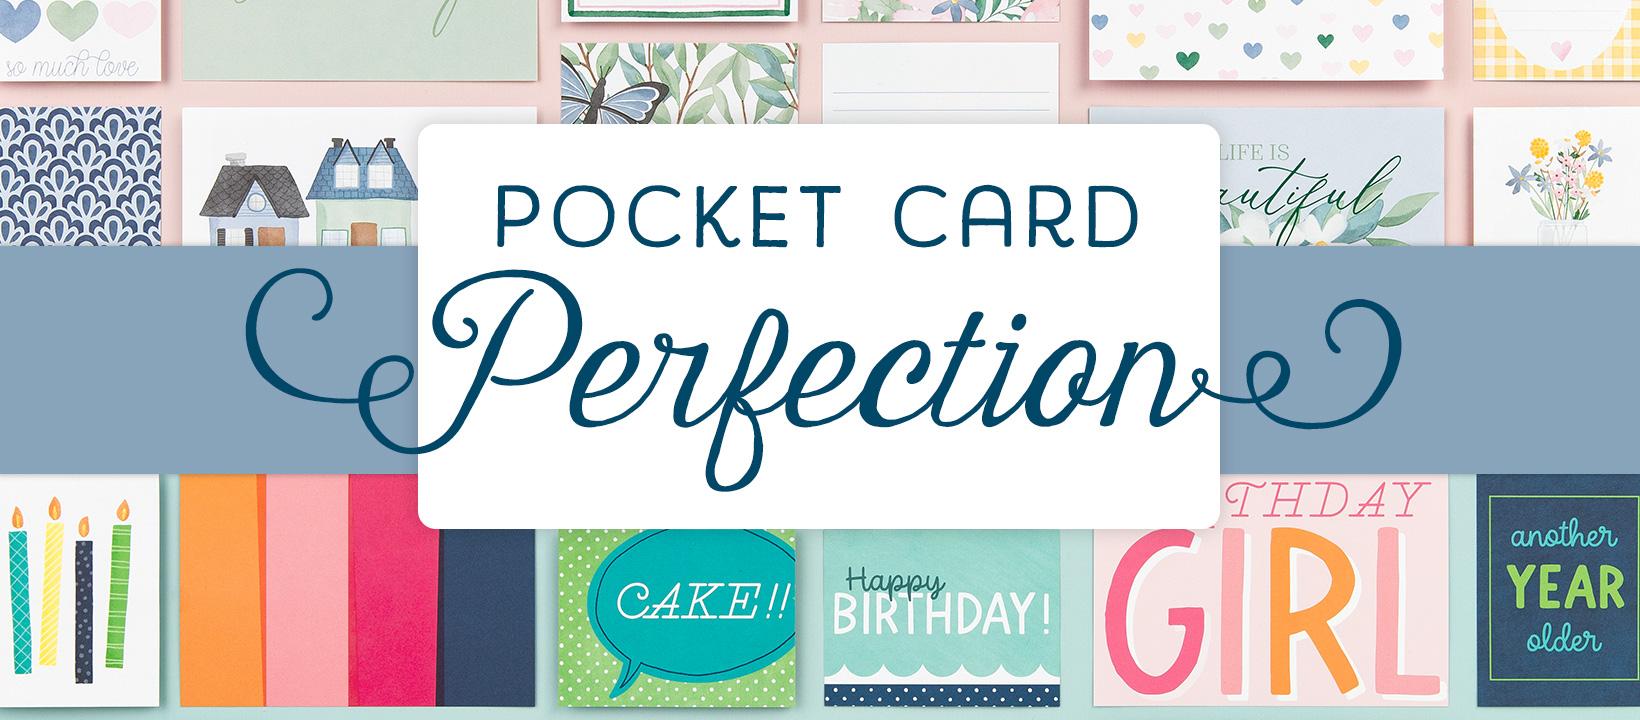 2102-sp-pocket-card-perfection-fb